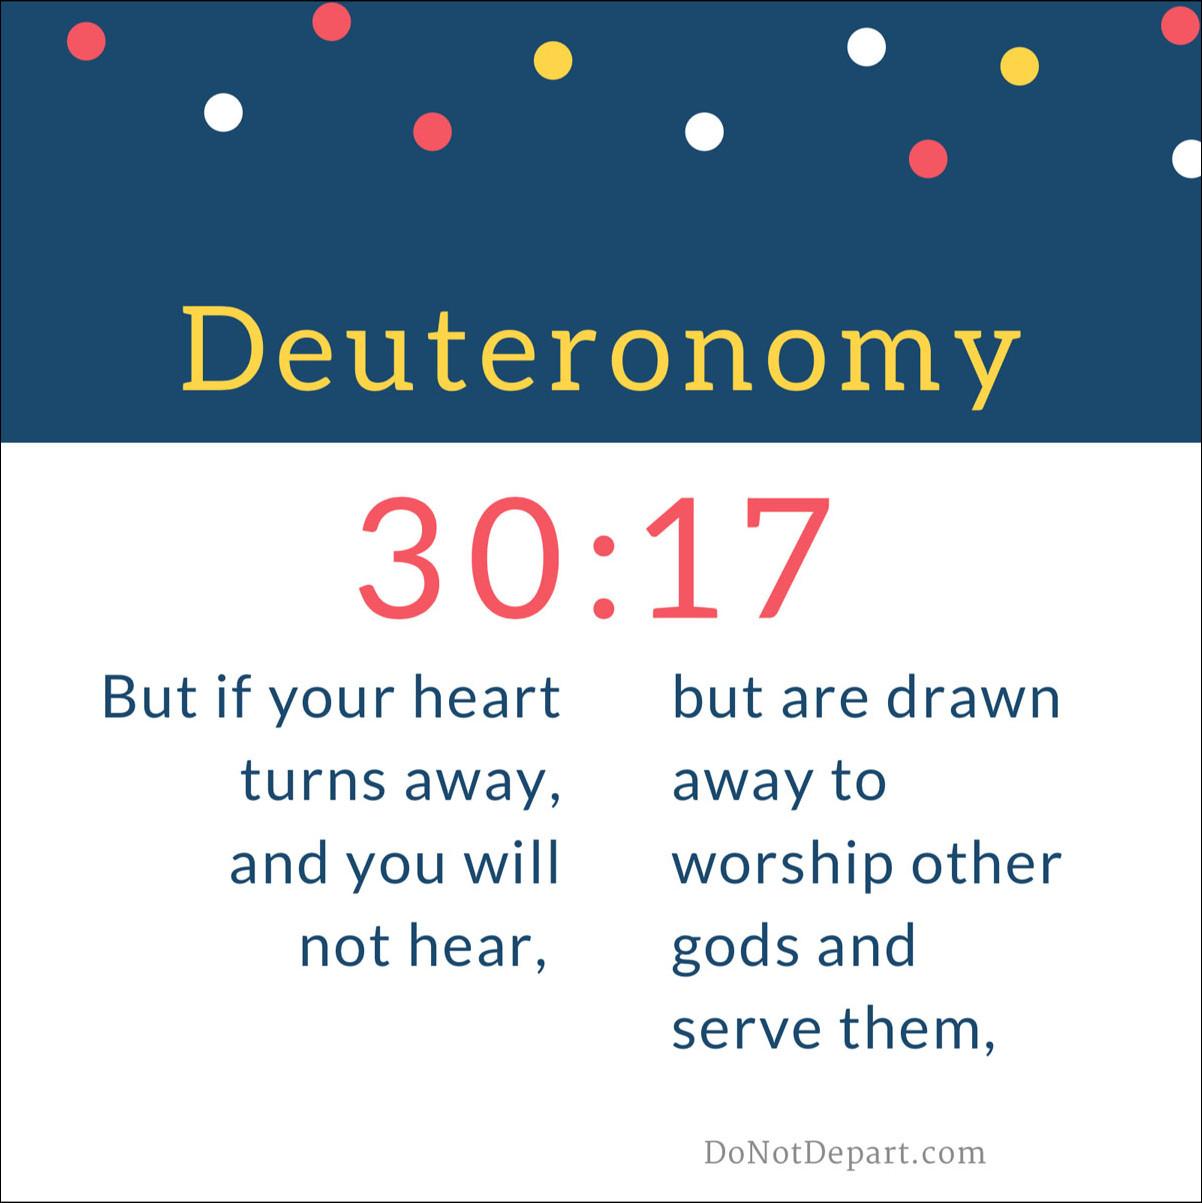 As the Heart Turns – Memorize Deuteronomy 30:17